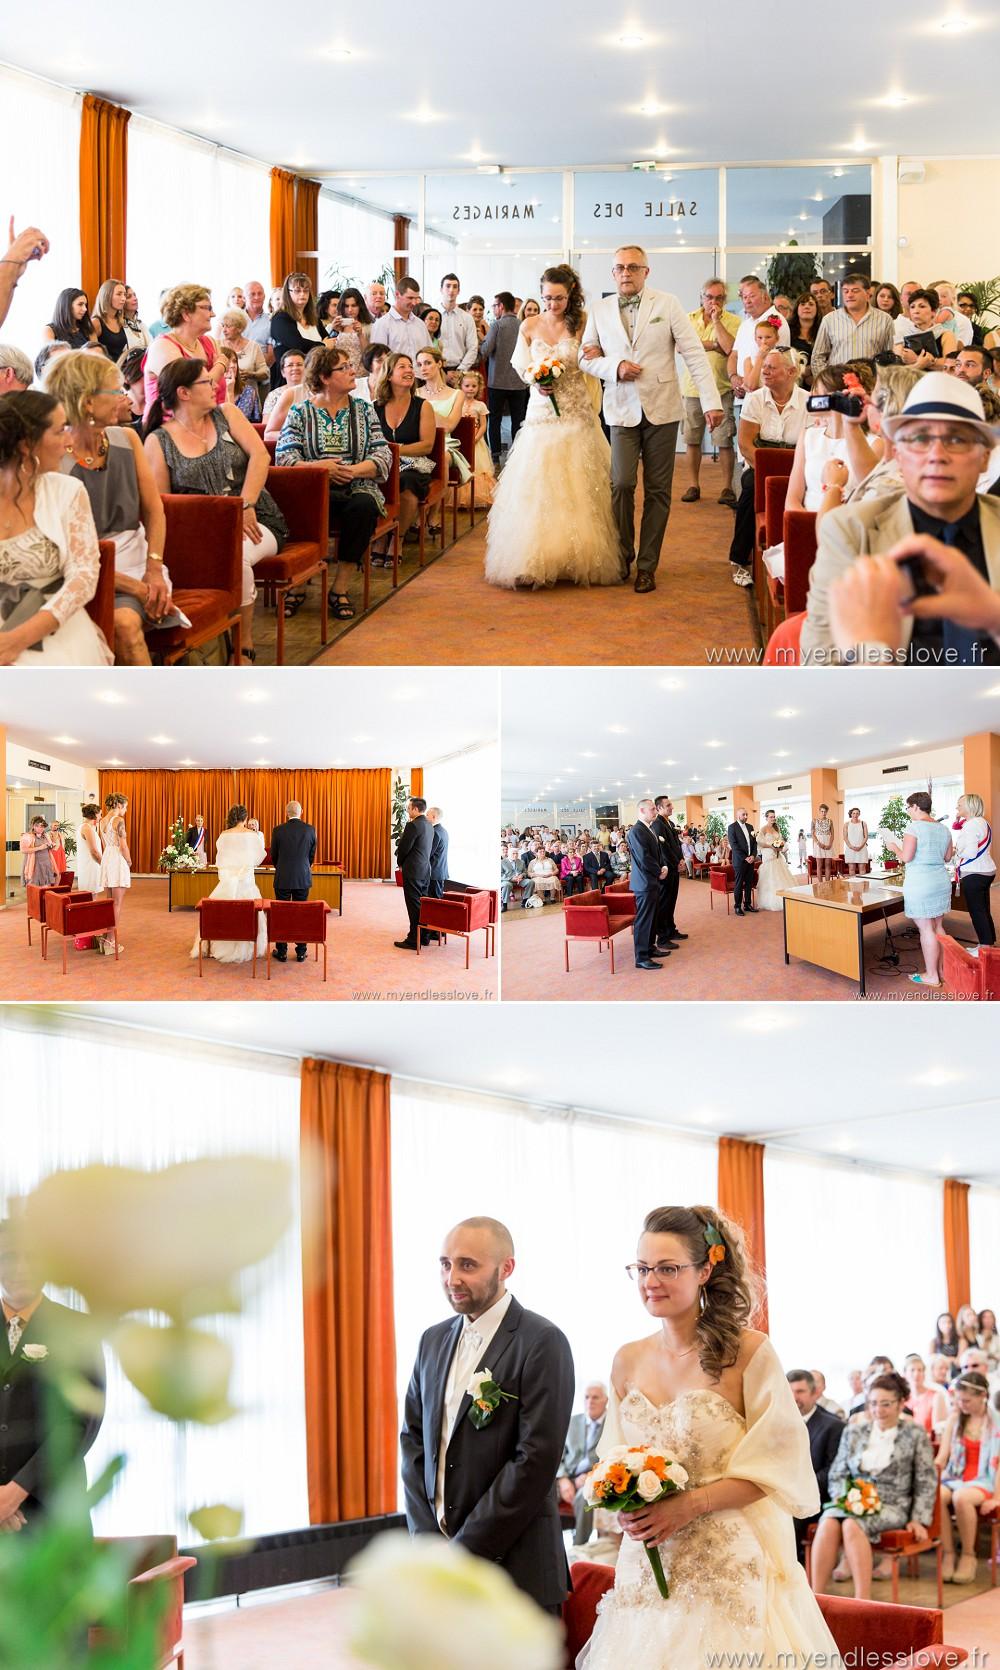 photographe mariage lens myendlesslove-photographe-mariage-lille-5-Strasbourg-Lens-mairie-cérémonie-civile-melanie-reichhart (2)